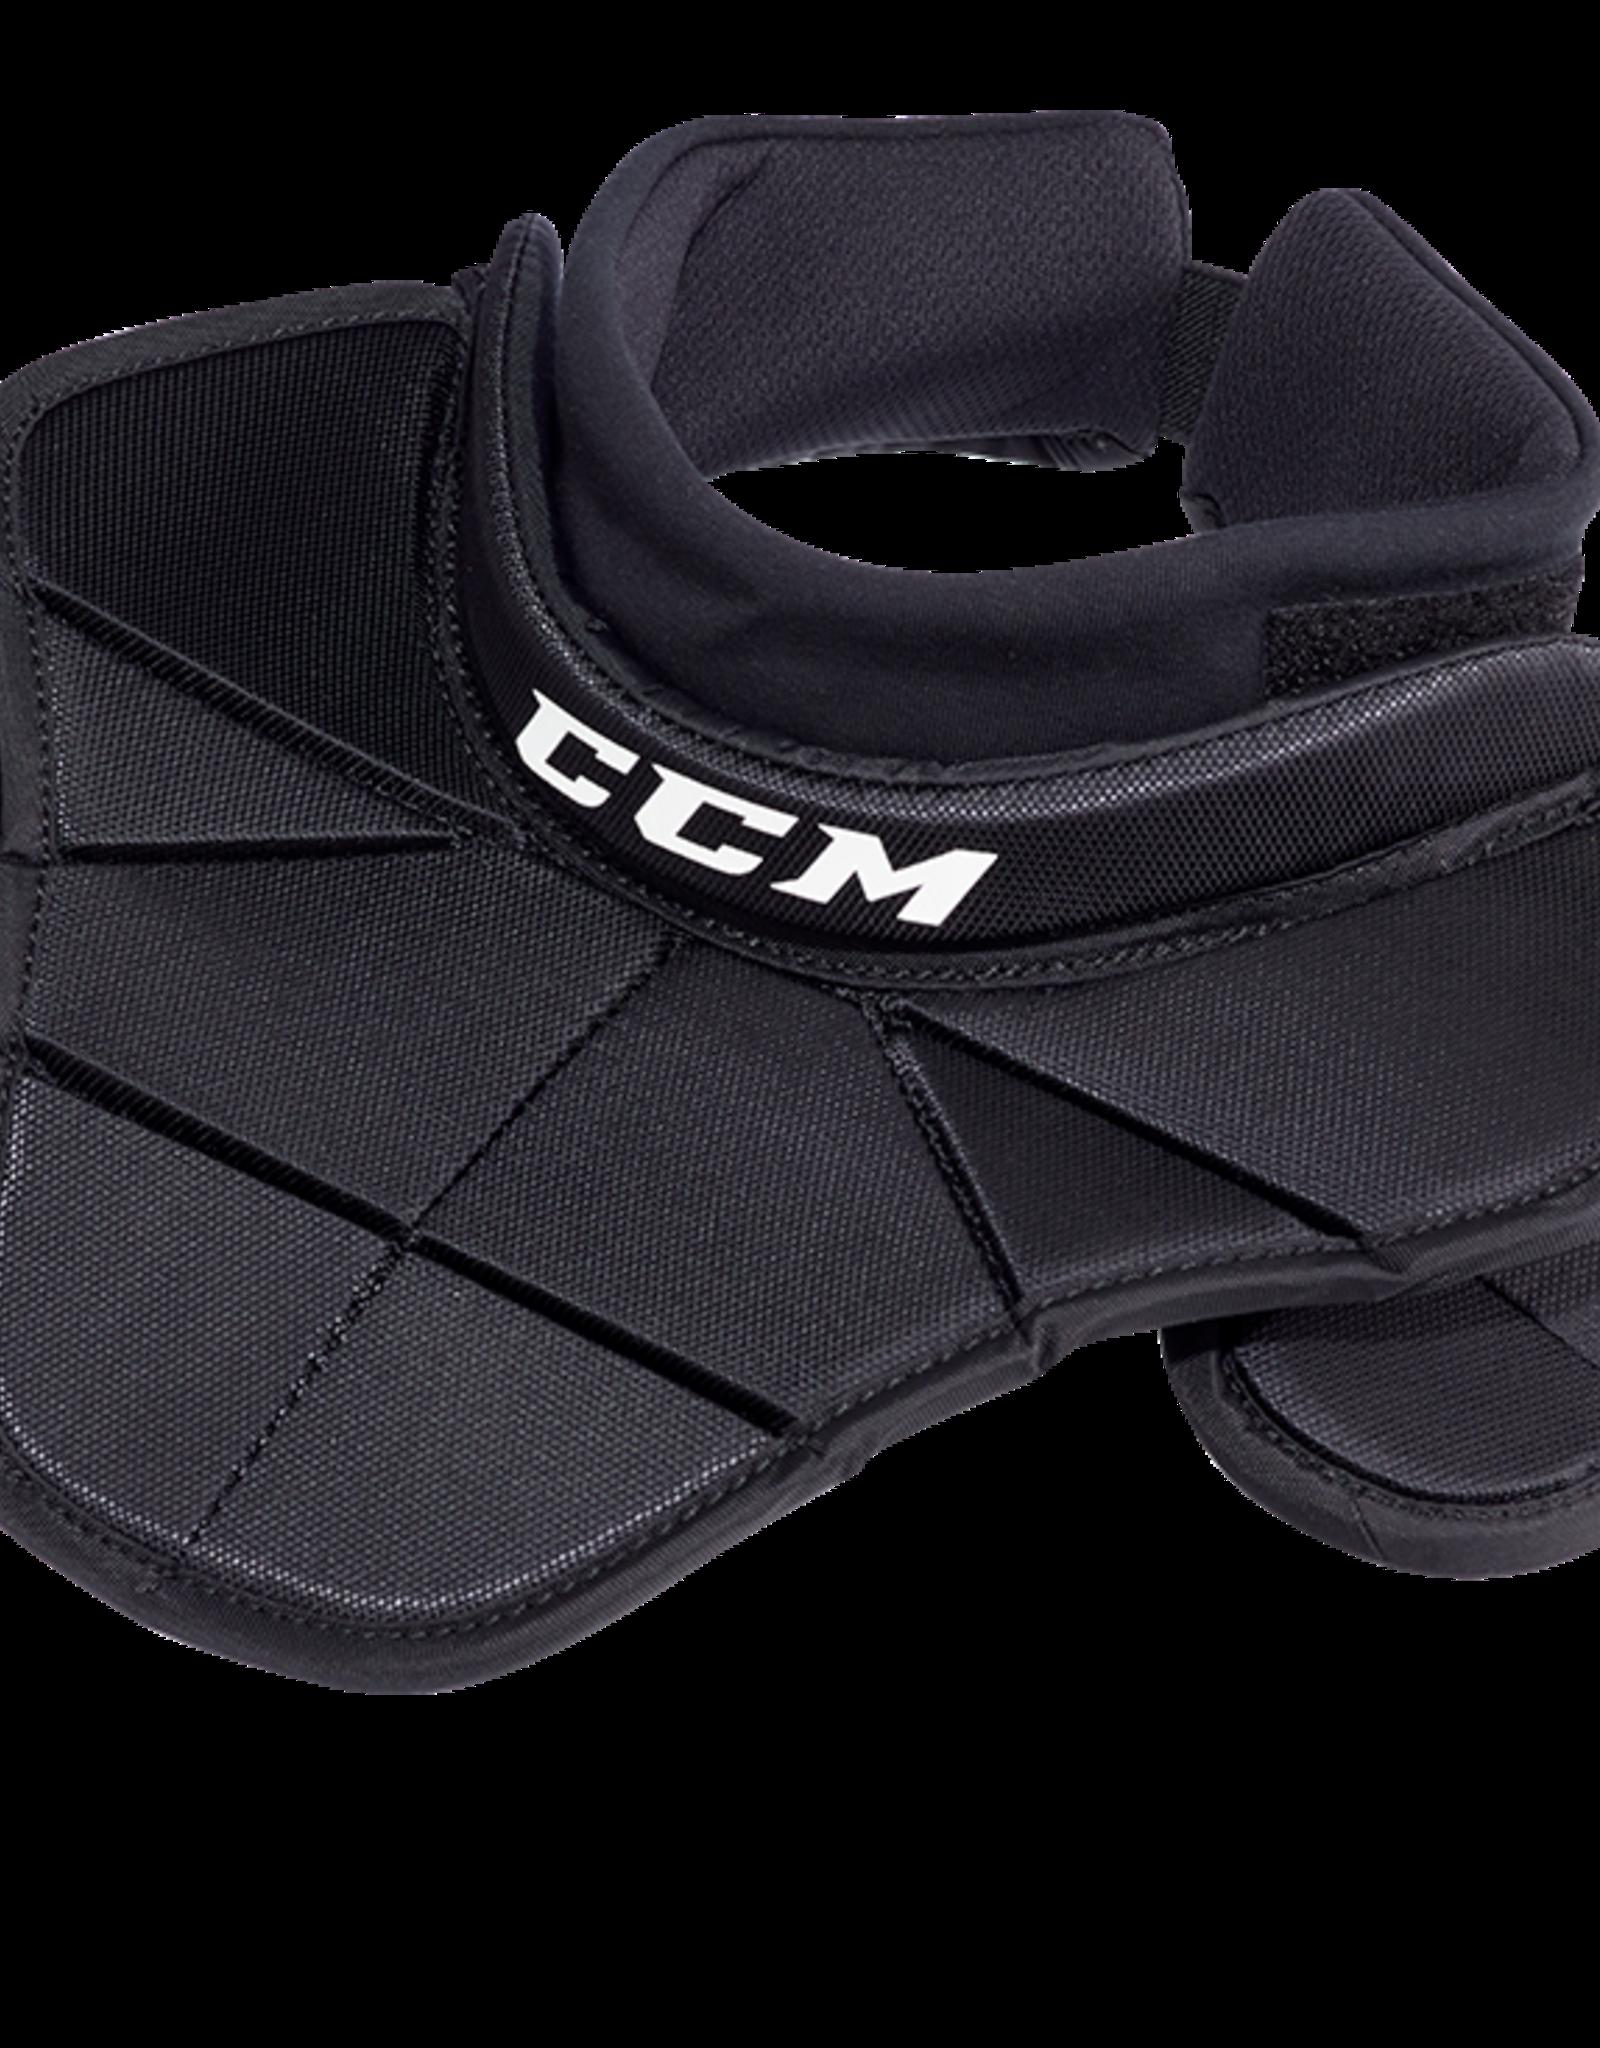 CCM TCG900 Senior Goalie Neck Guard